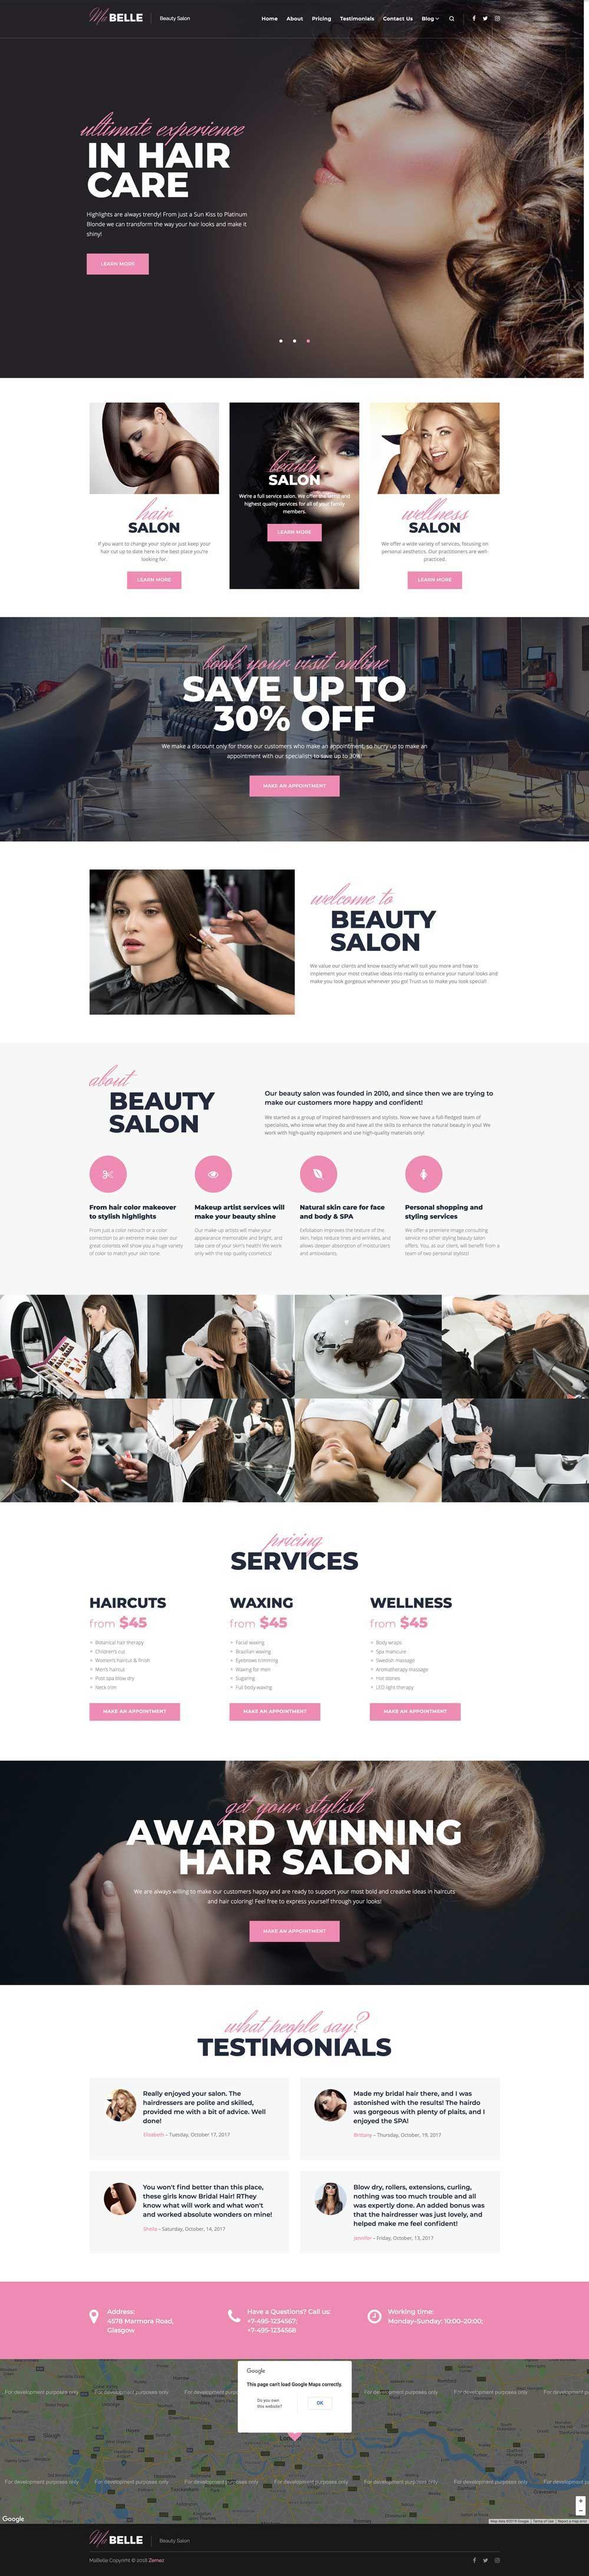 fun websites for women